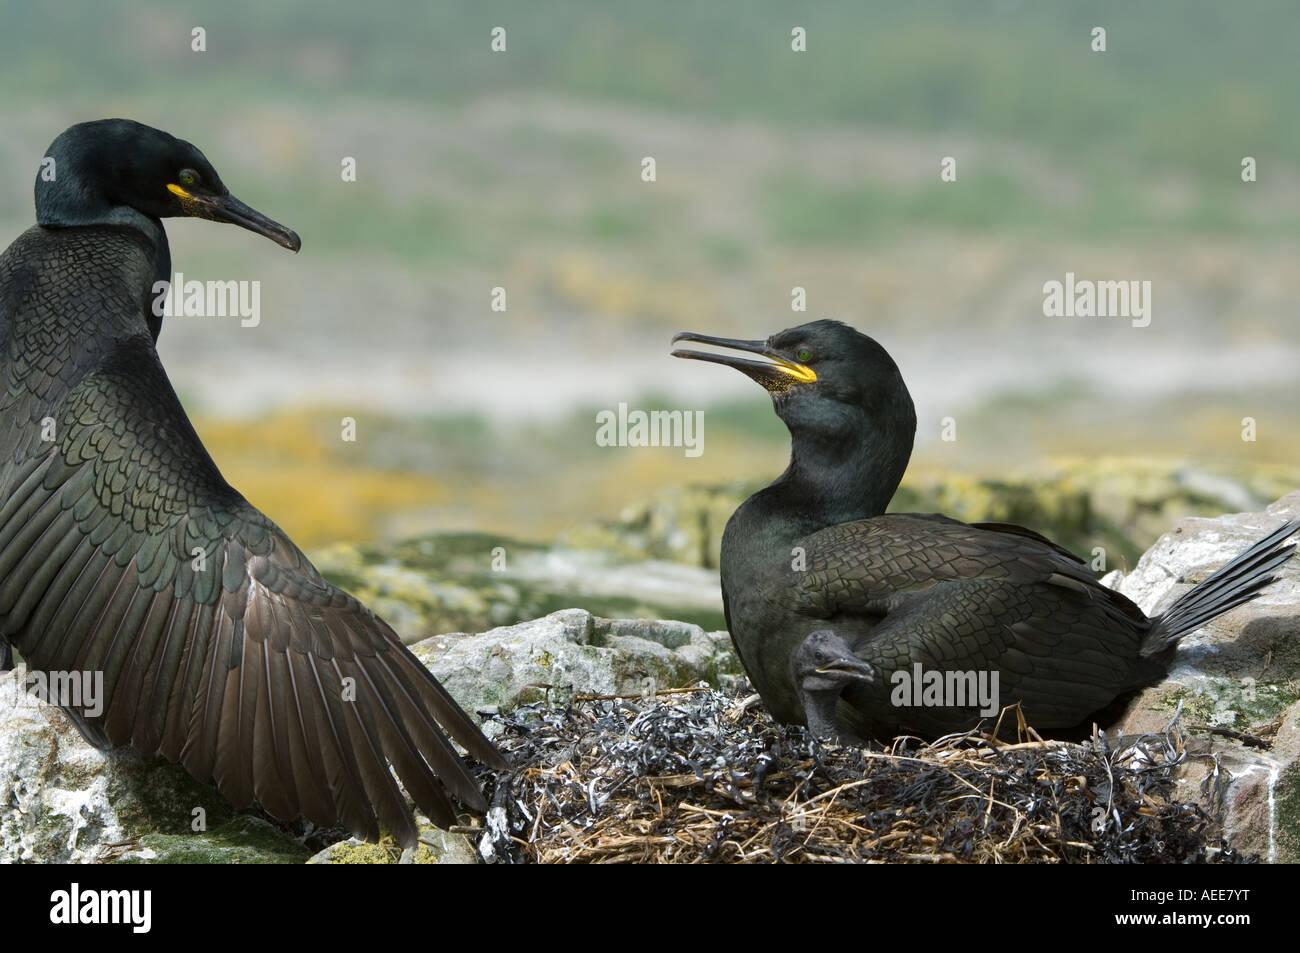 European Shag (Phalacrocorax aristotelis) pair at the nest Farne Islands Northumberland England June - Stock Image